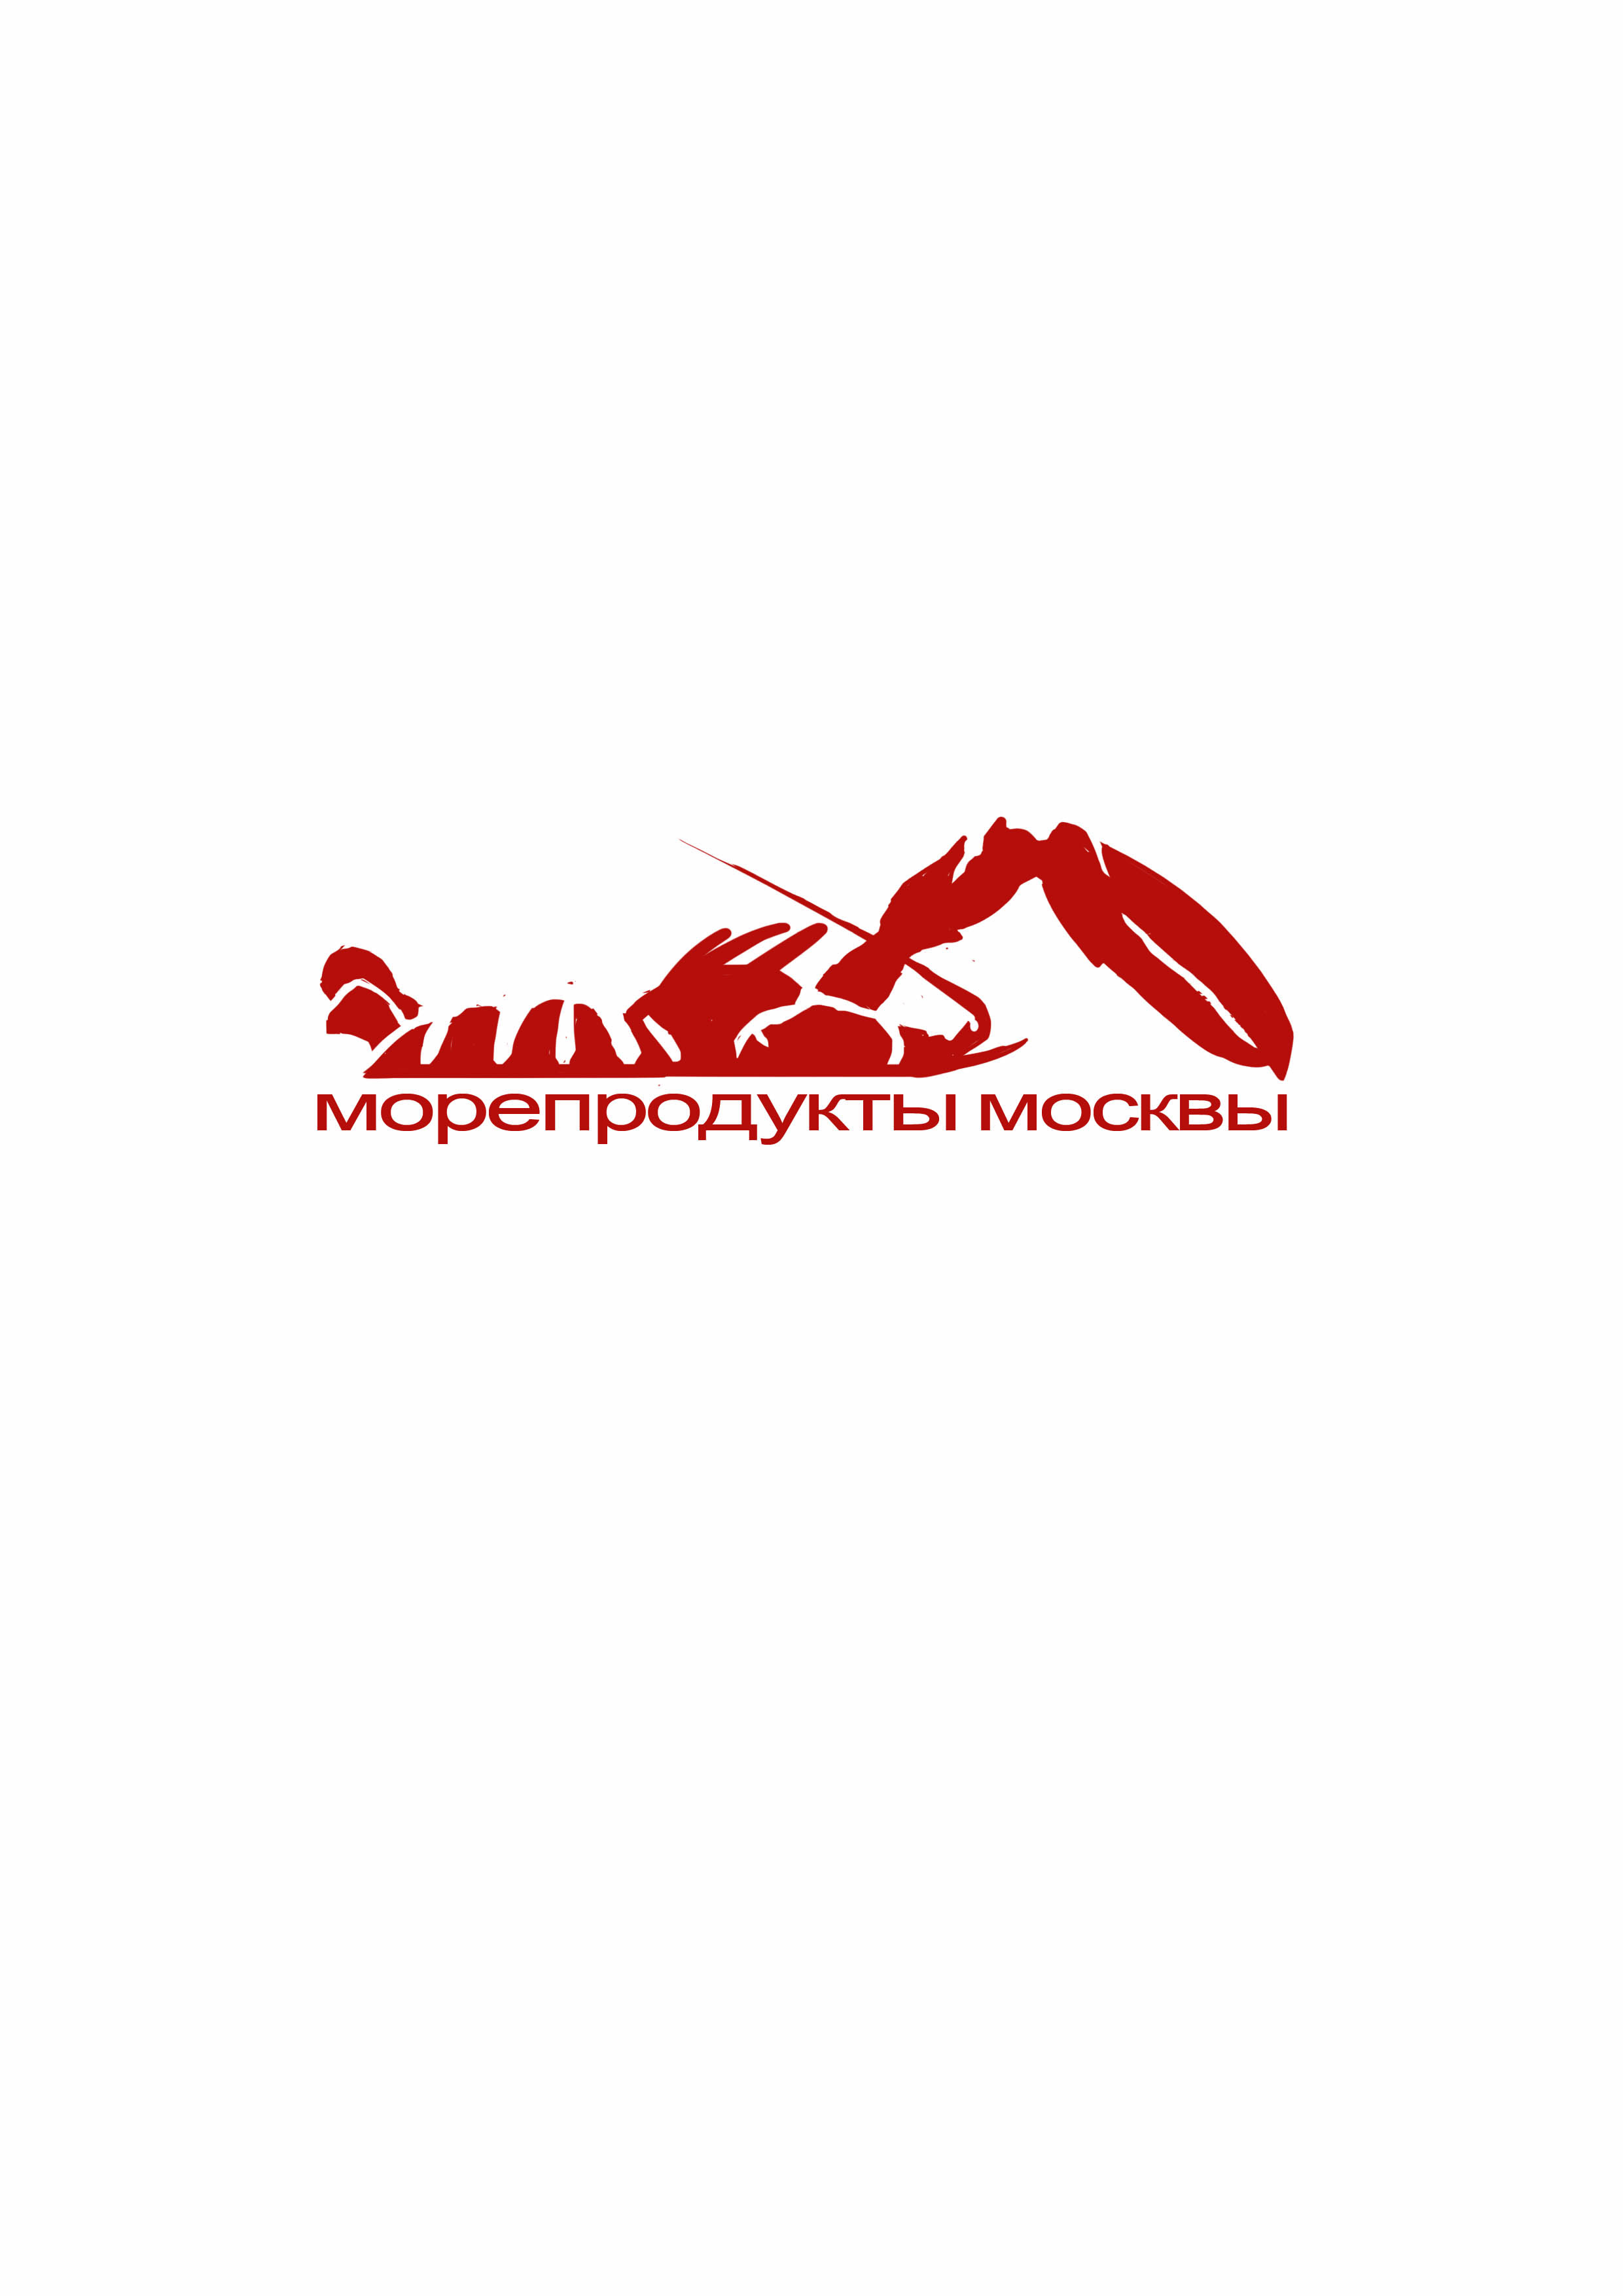 Разработать логотип.  фото f_4065ec778c0804eb.jpg